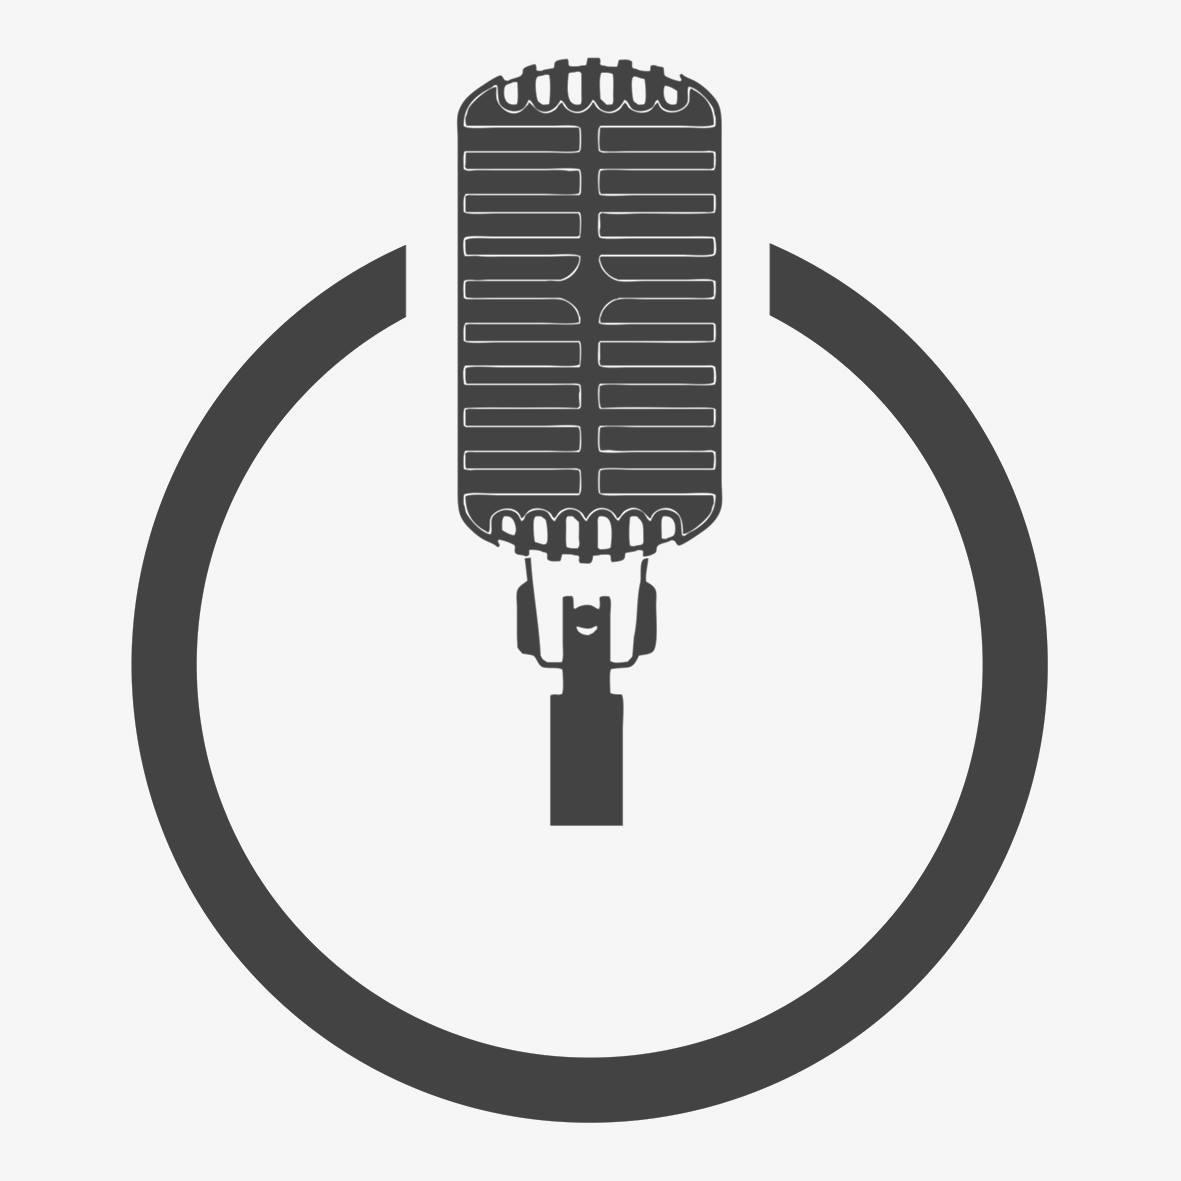 Click Radio Station